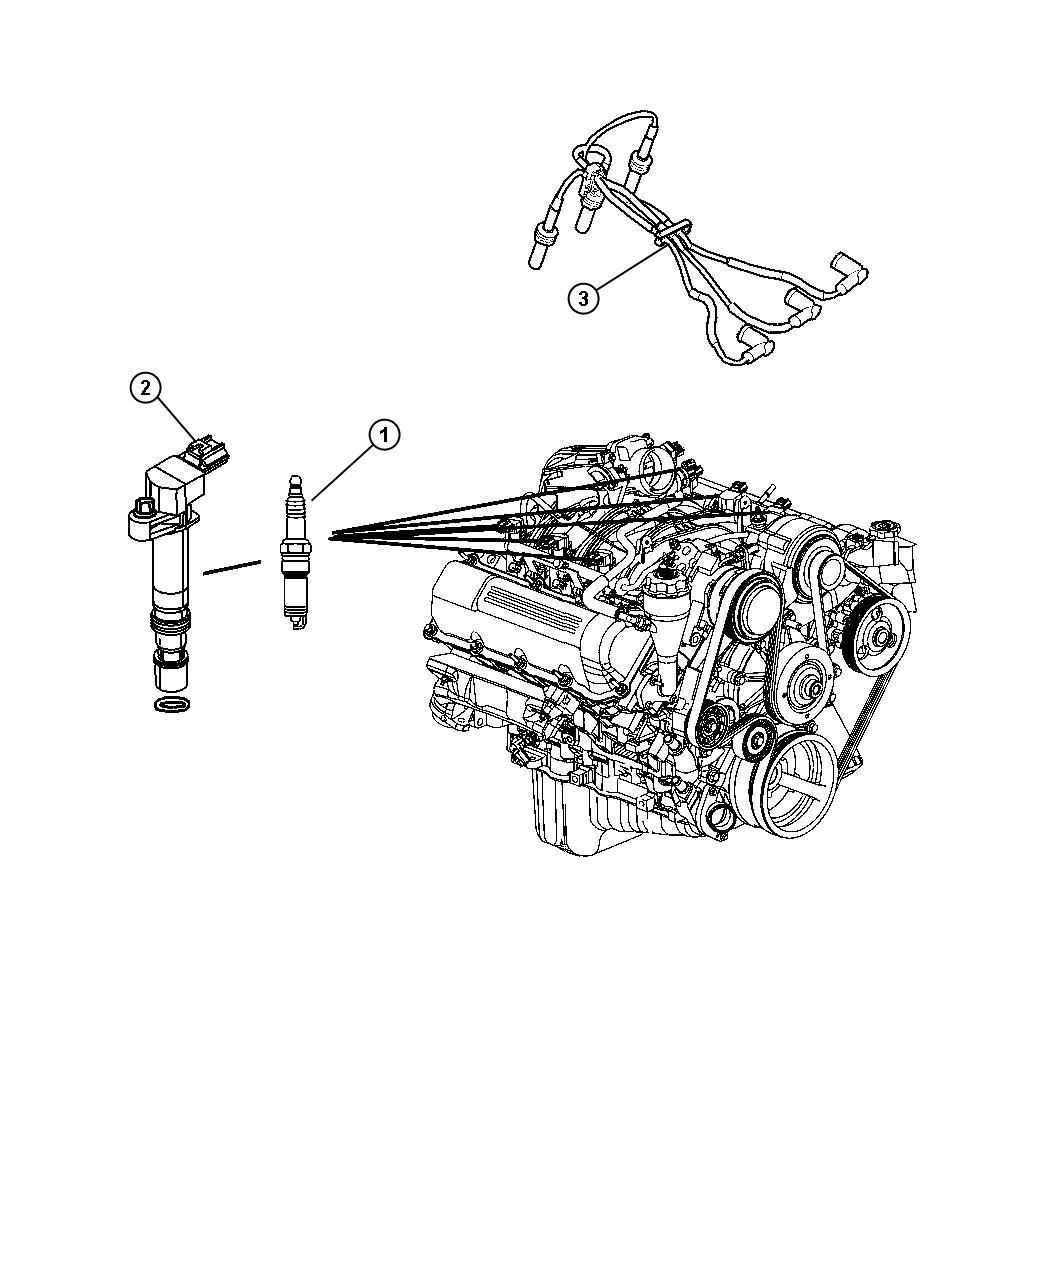 Dodge Ram Ignition Diagram